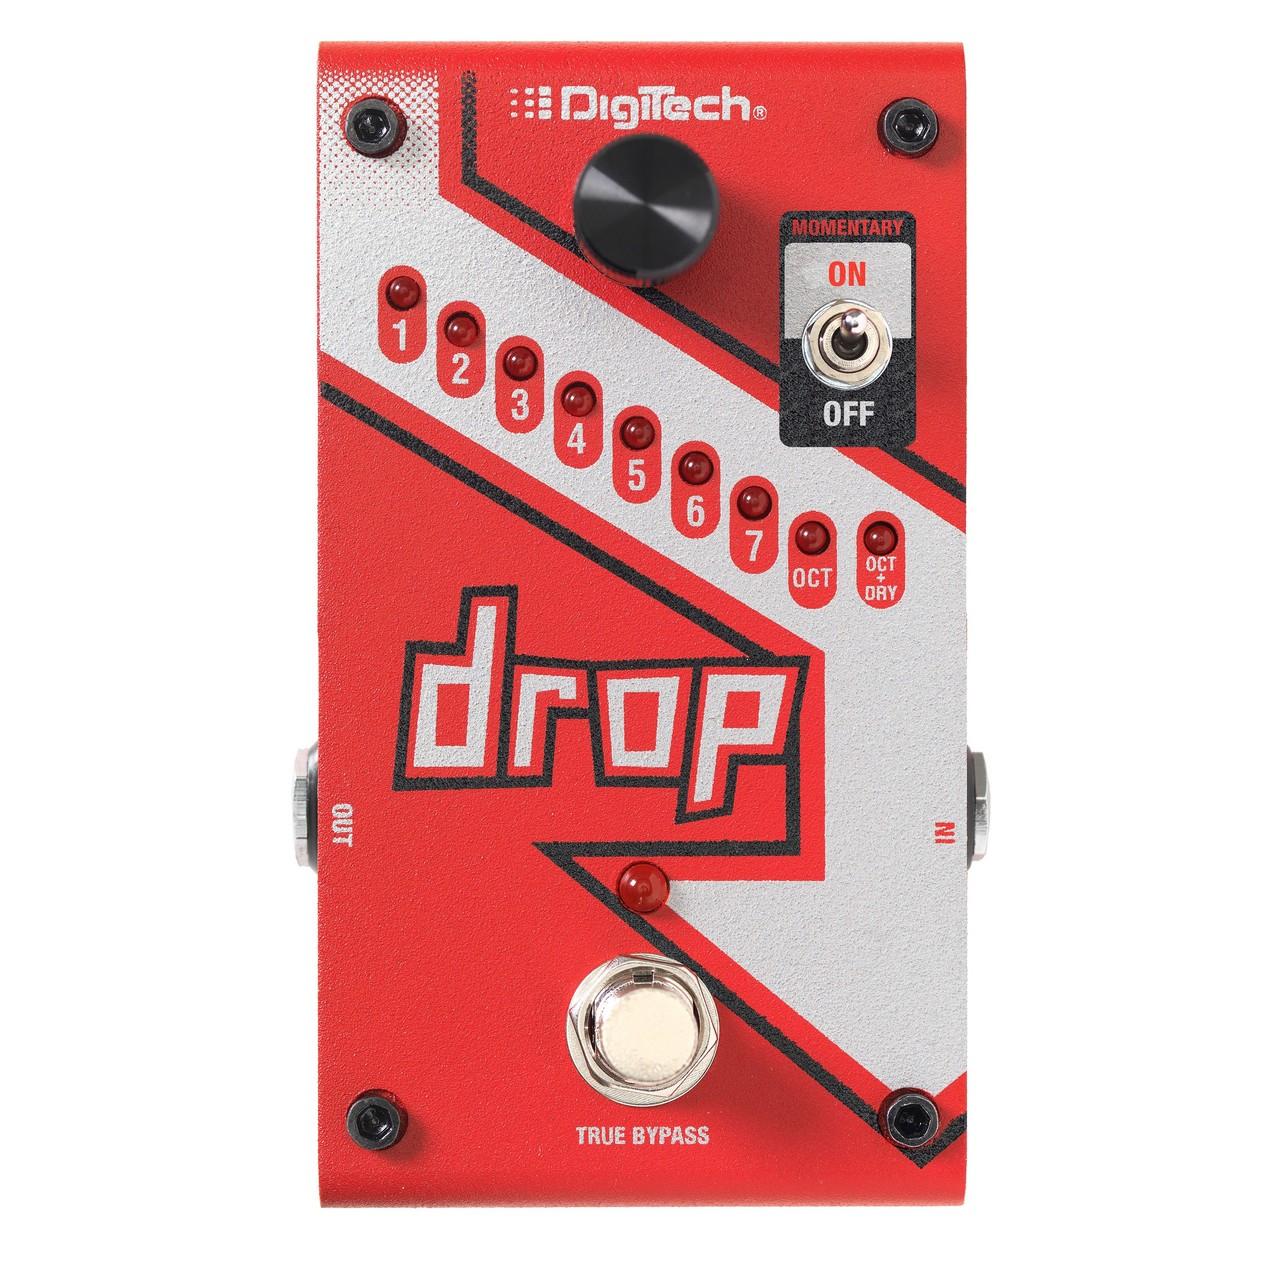 DigiTech Drop [polyphonic pitch shifter]